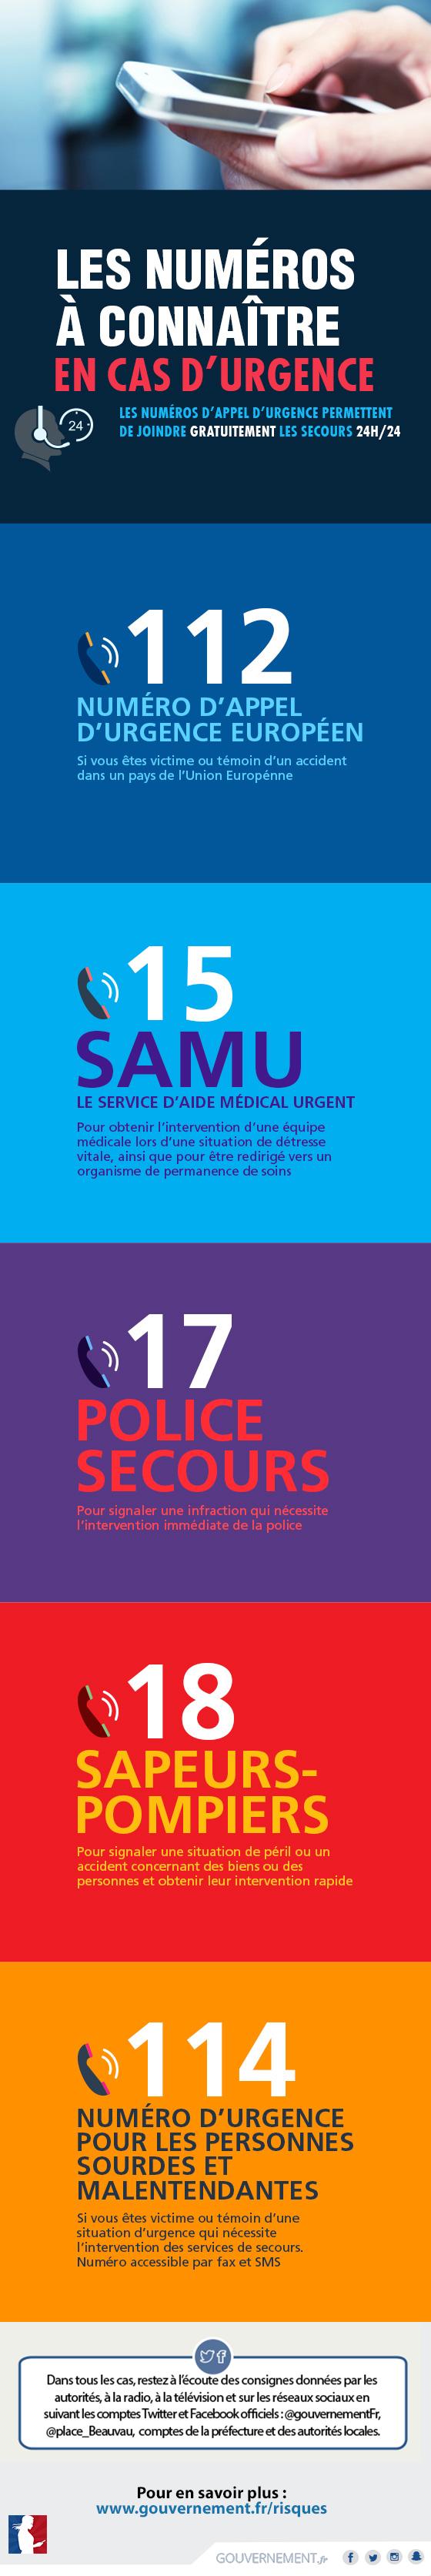 Informations d'urgence